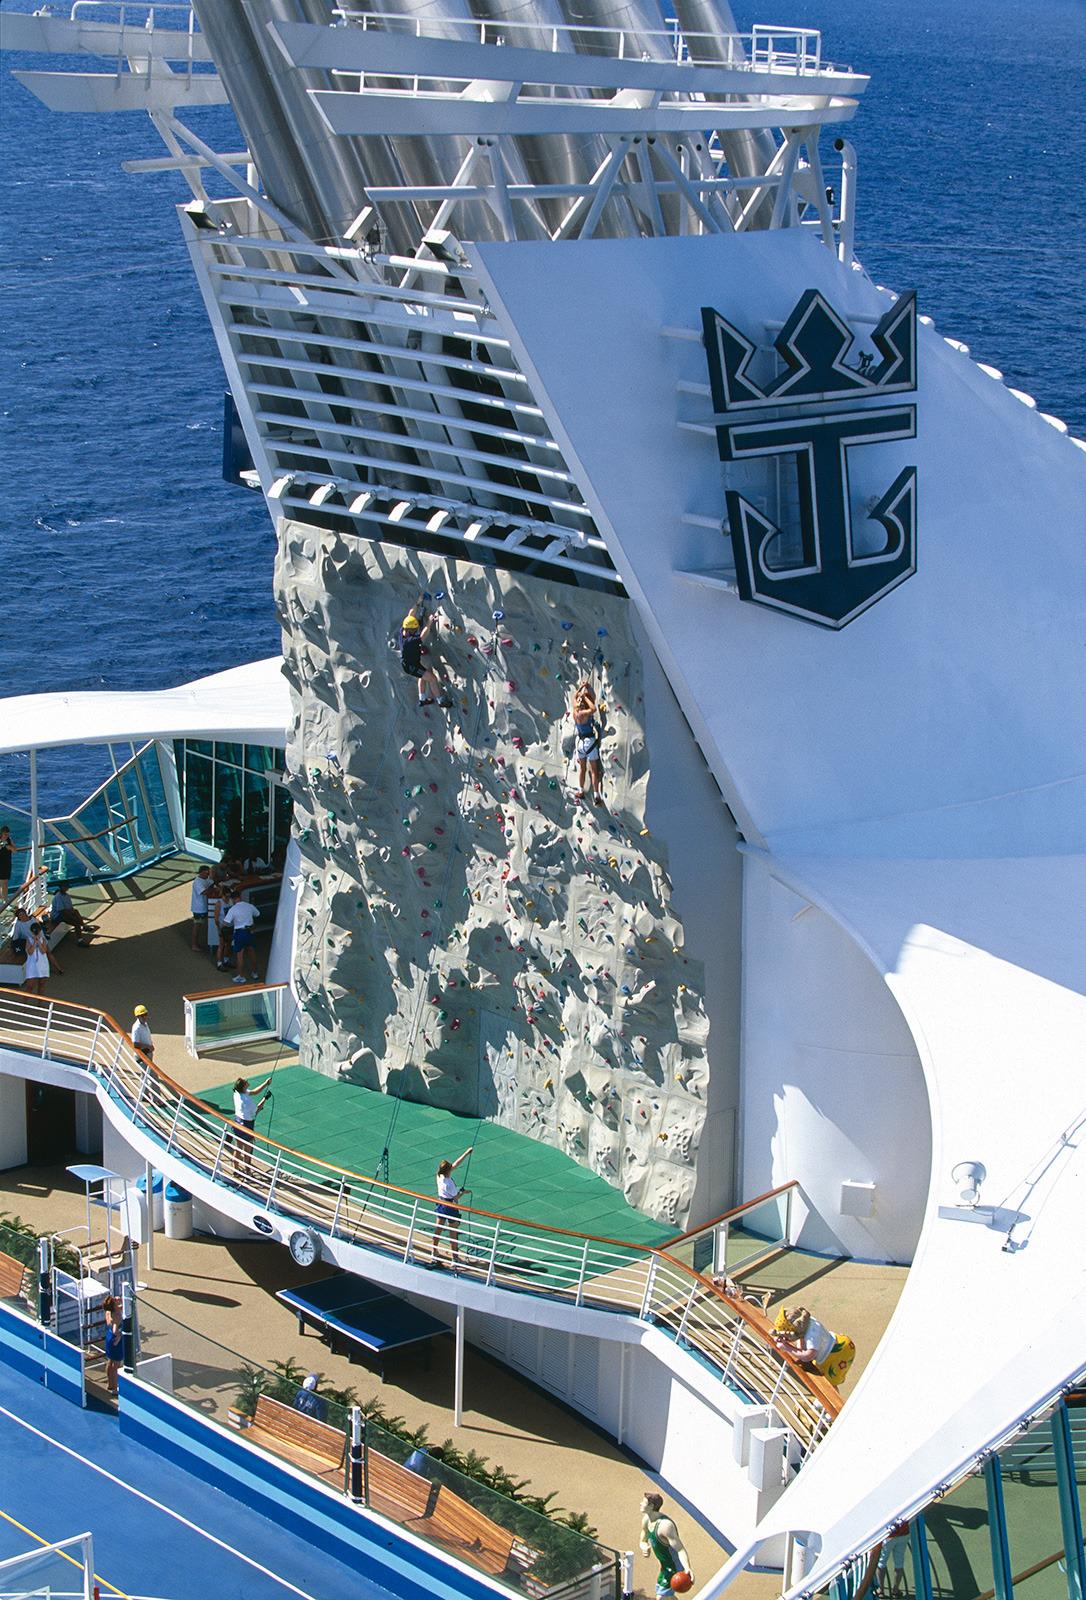 Круизный лайнер Mariner of the Seas - Стена для скалолазания (RockWall)